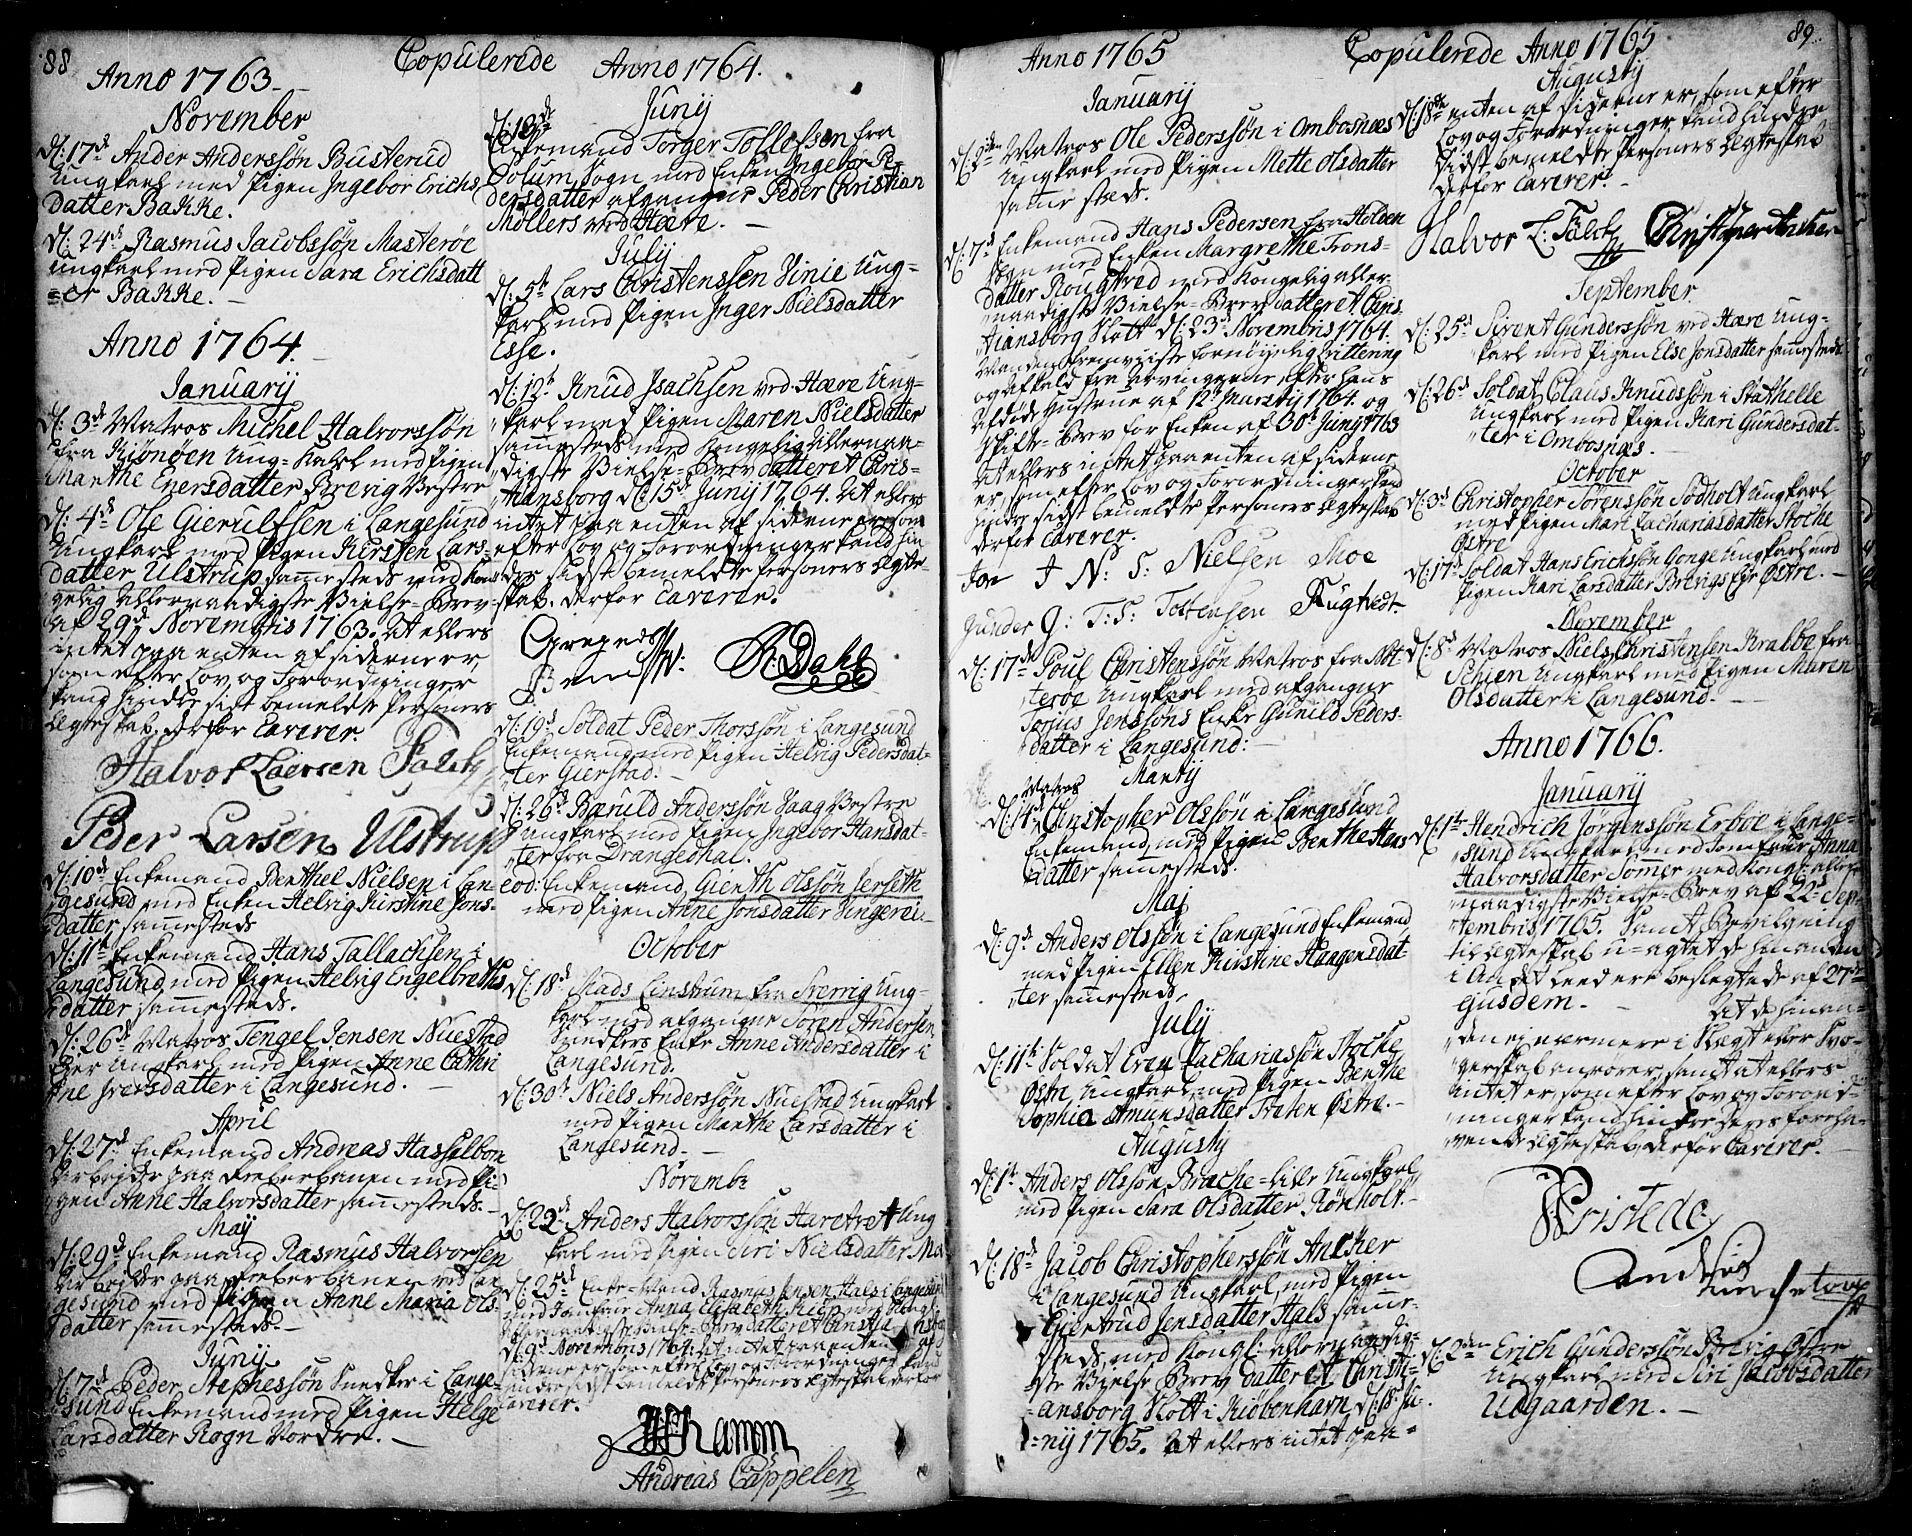 SAKO, Bamble kirkebøker, F/Fa/L0001: Ministerialbok nr. I 1, 1702-1774, s. 88-89